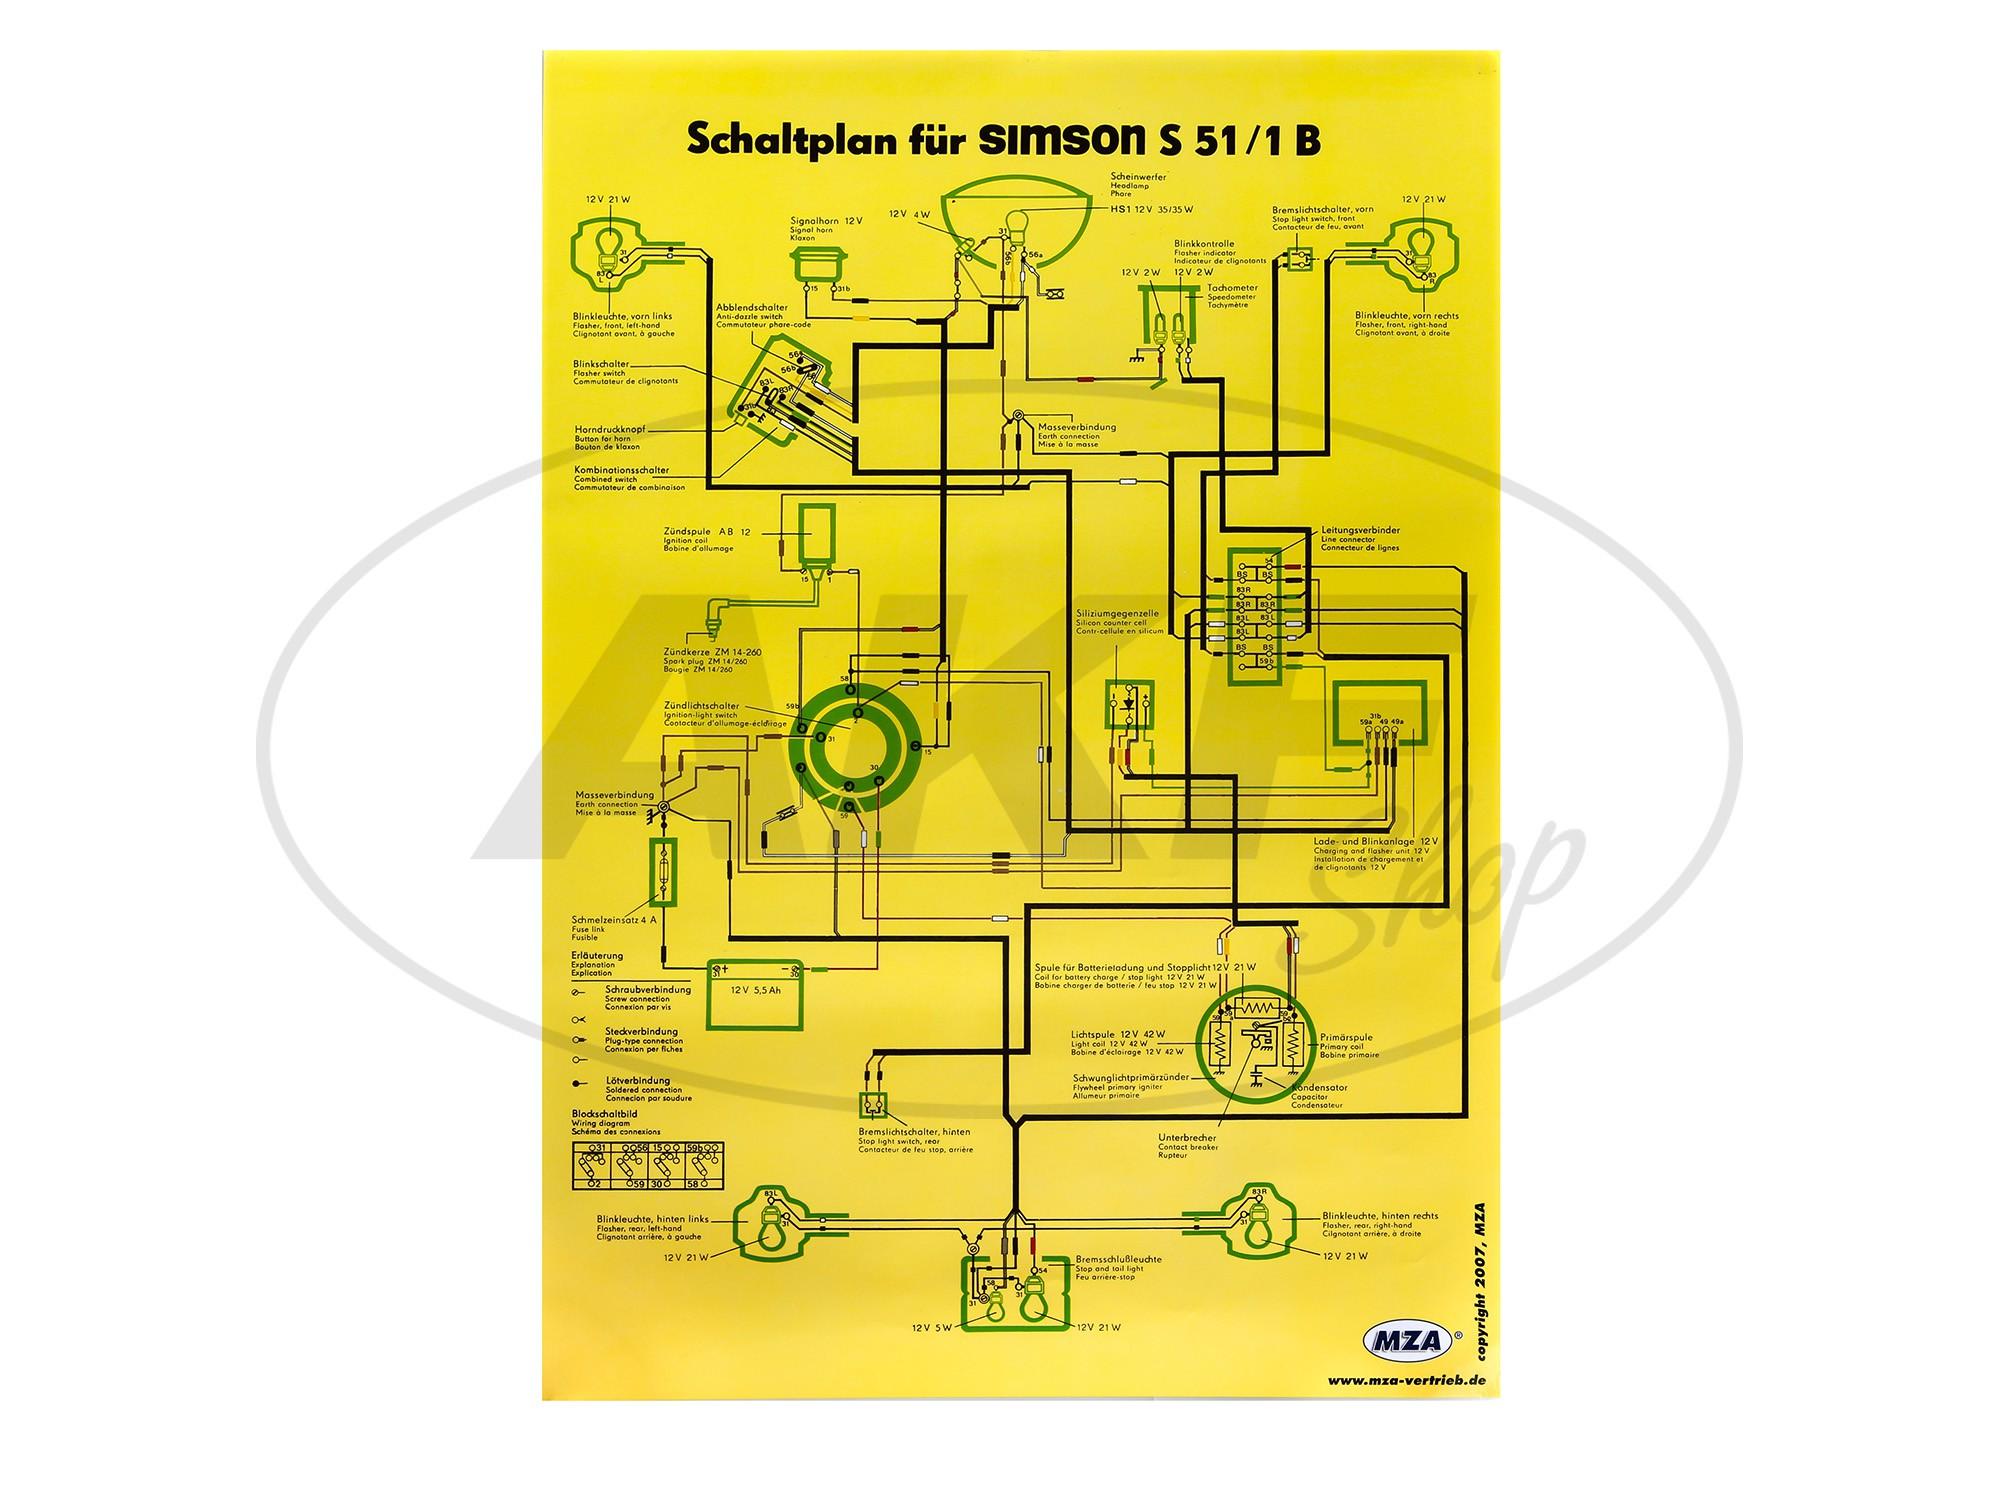 schaltplan farbposter 40x60cm simson s51 1b 12v. Black Bedroom Furniture Sets. Home Design Ideas